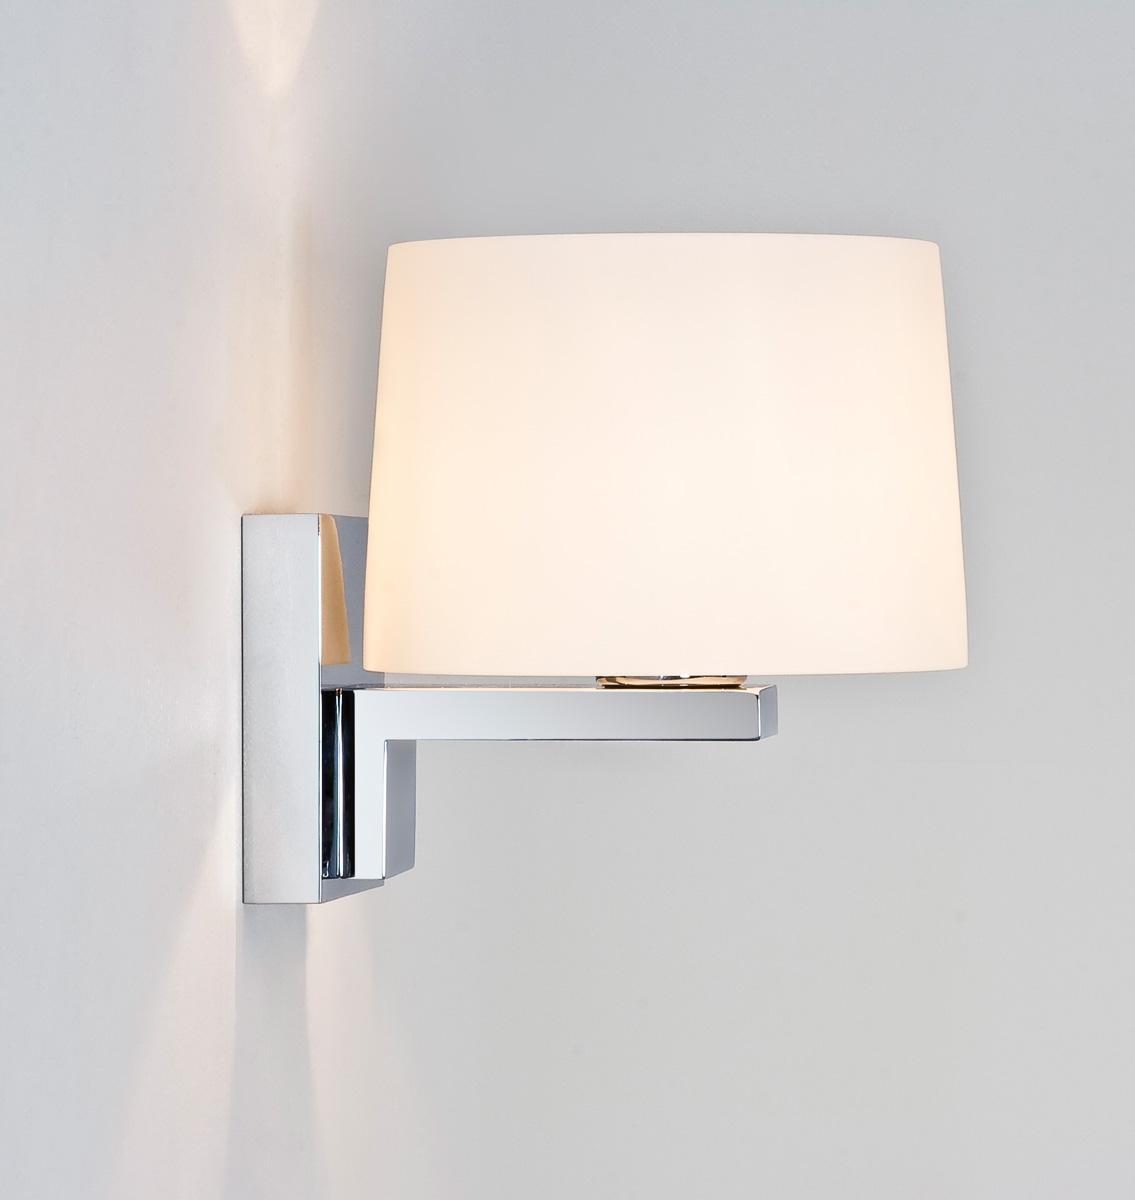 BRONI ROUND lampada parete bagno